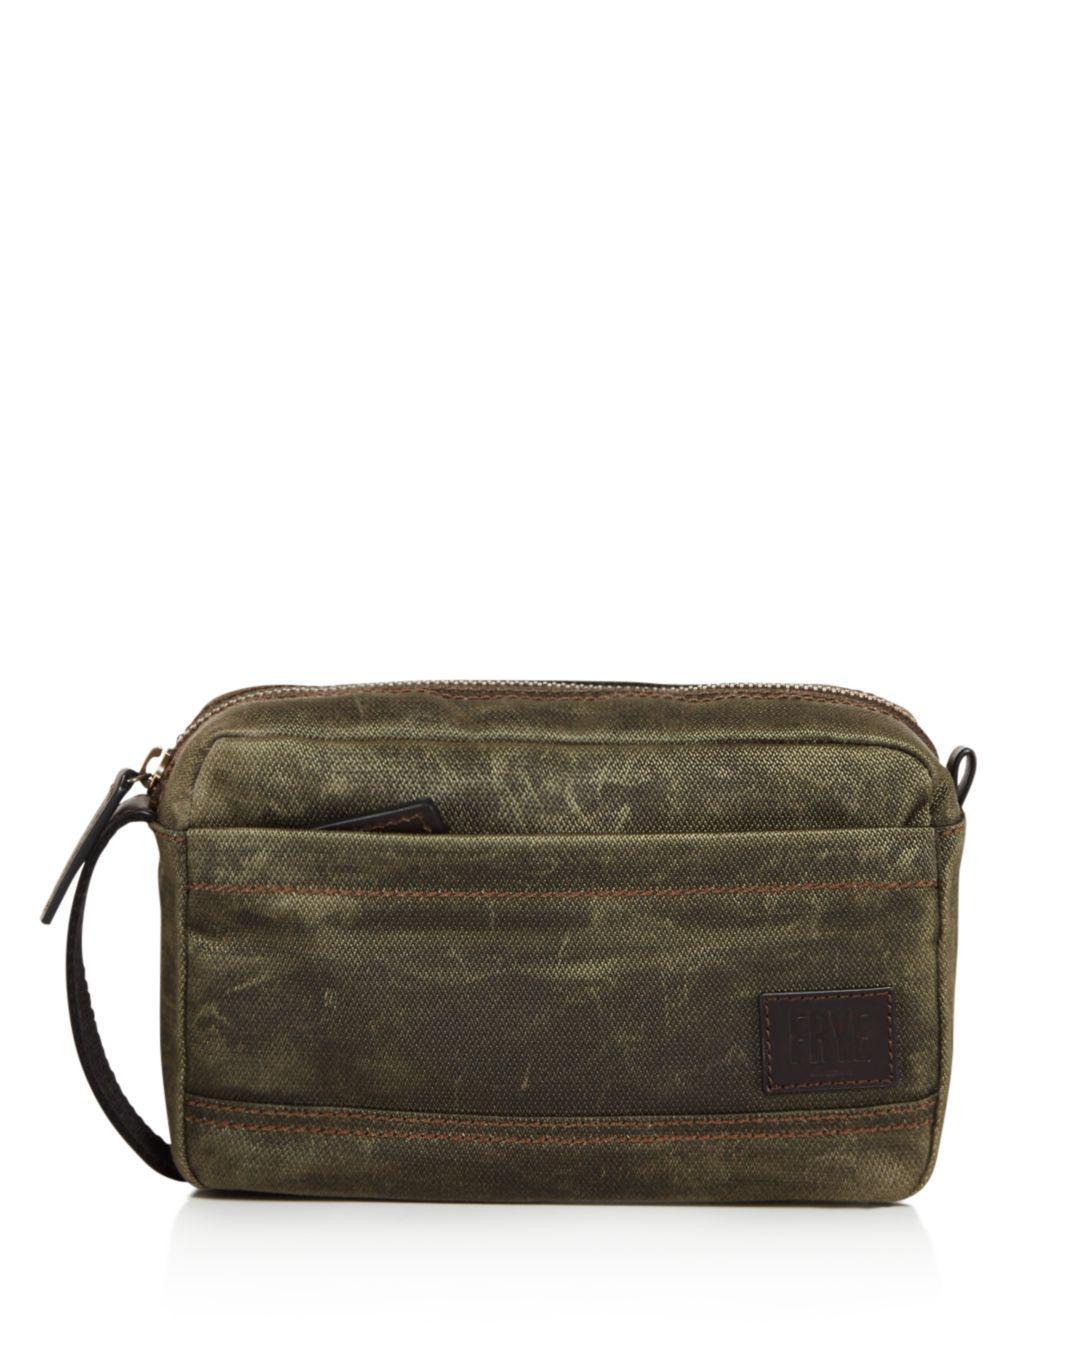 ba9210f442 Frye Carter Slim Toiletry Bag in Green for Men - Lyst